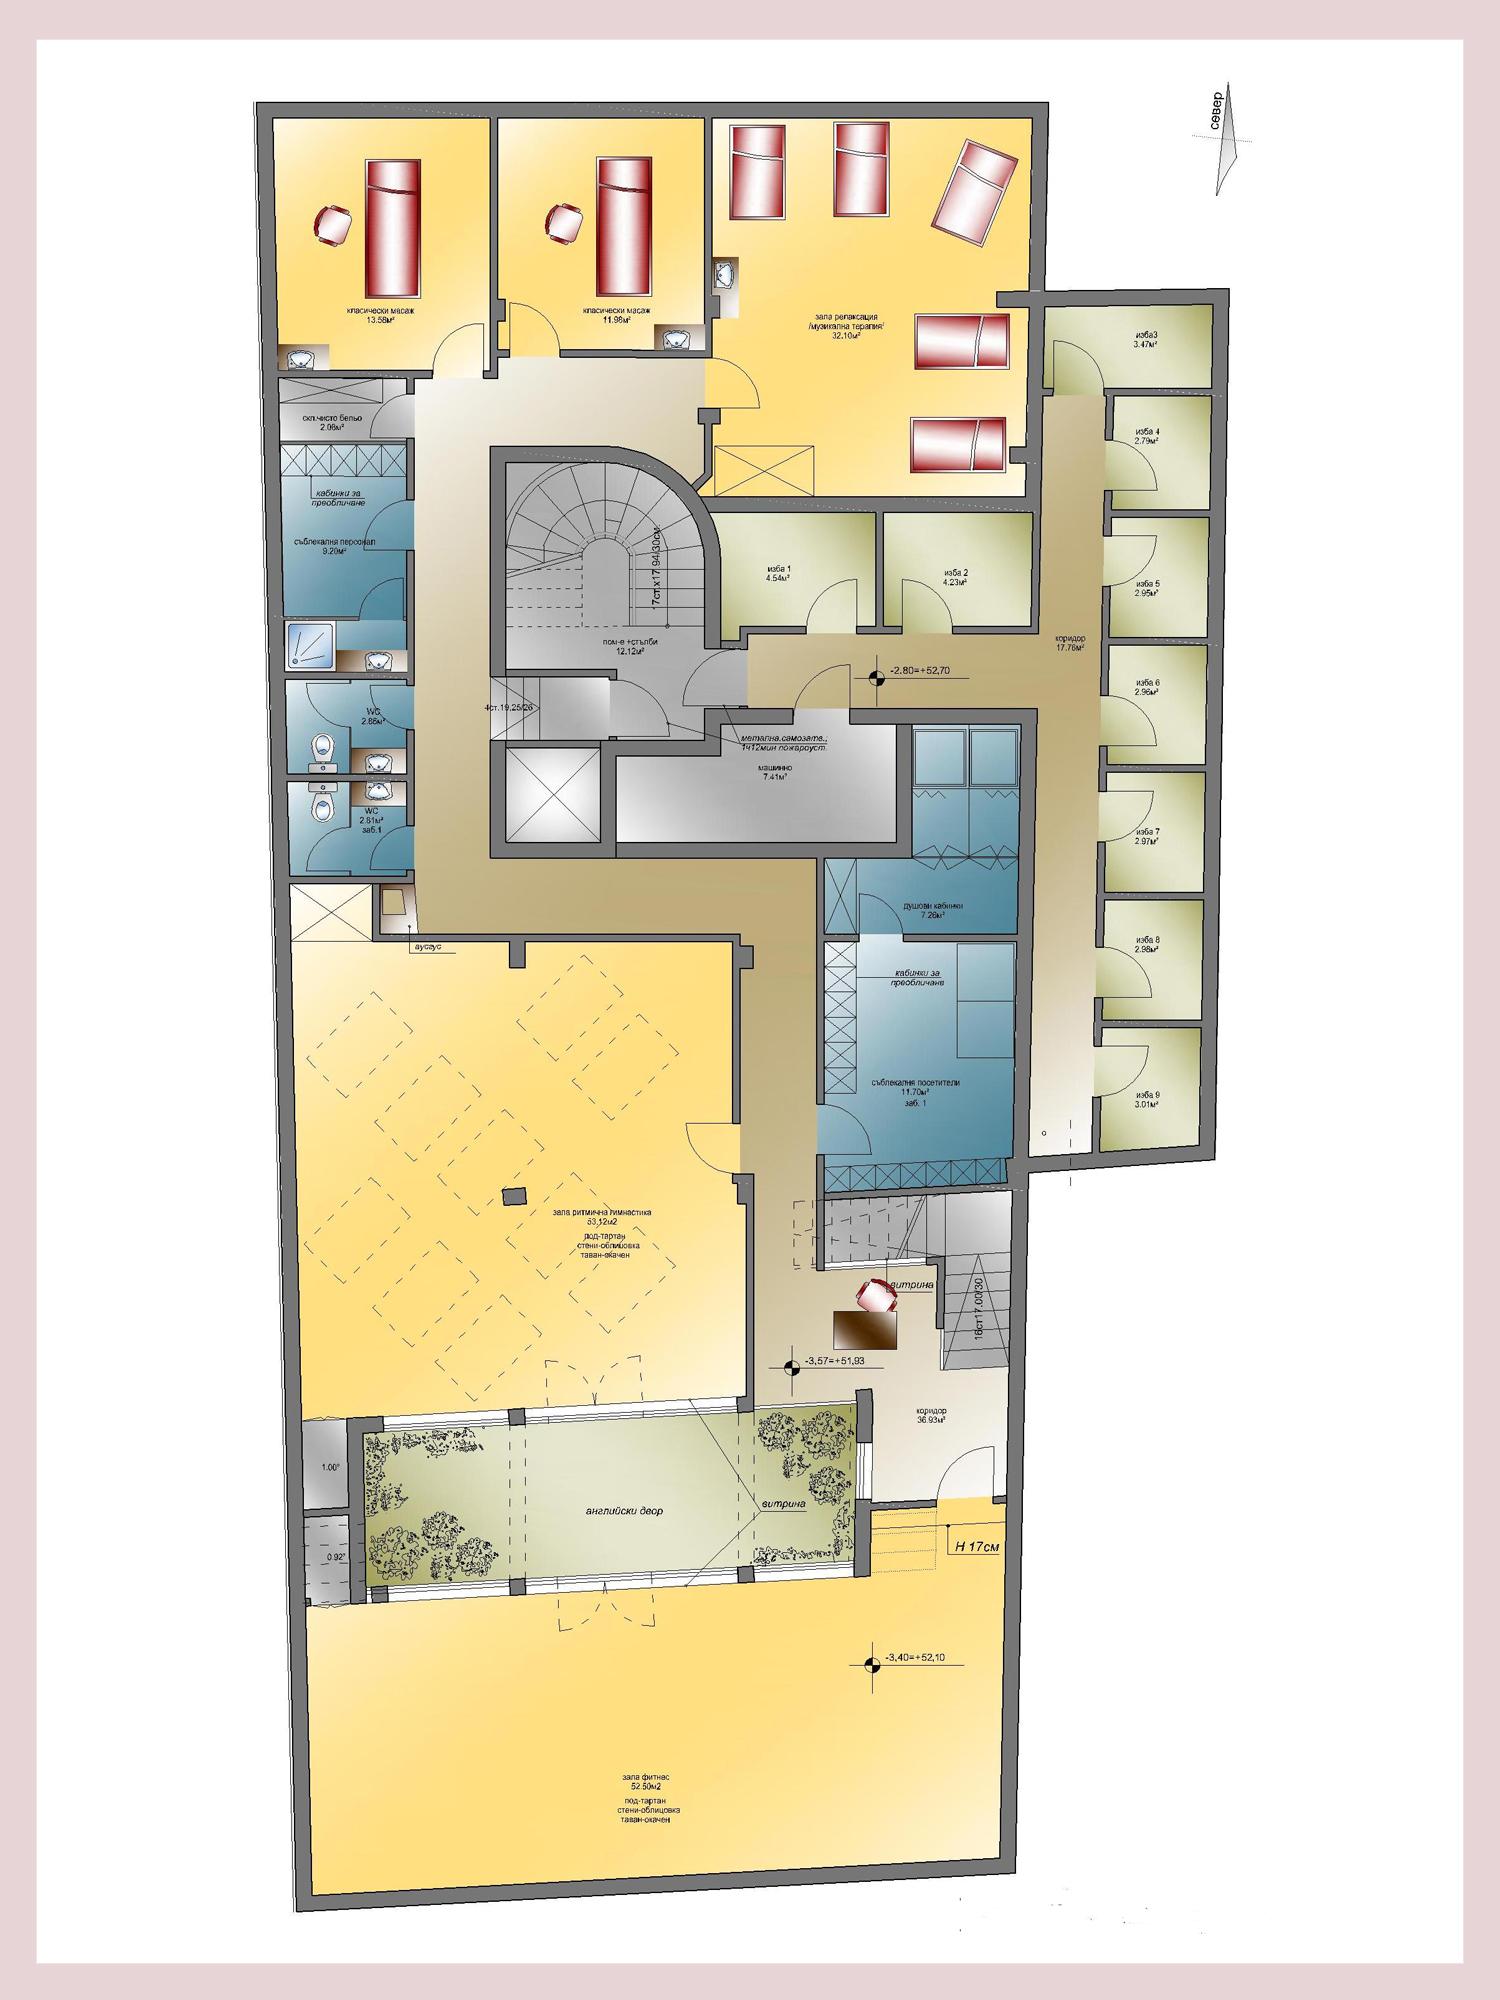 Apartment complex briz in varna for Hair salon floor plans download